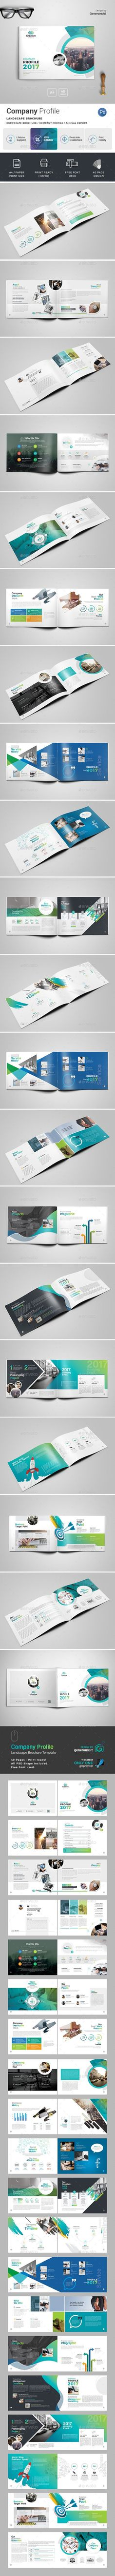 Company Profile Landscape Brochure 40 Page - Brochures Print Templates